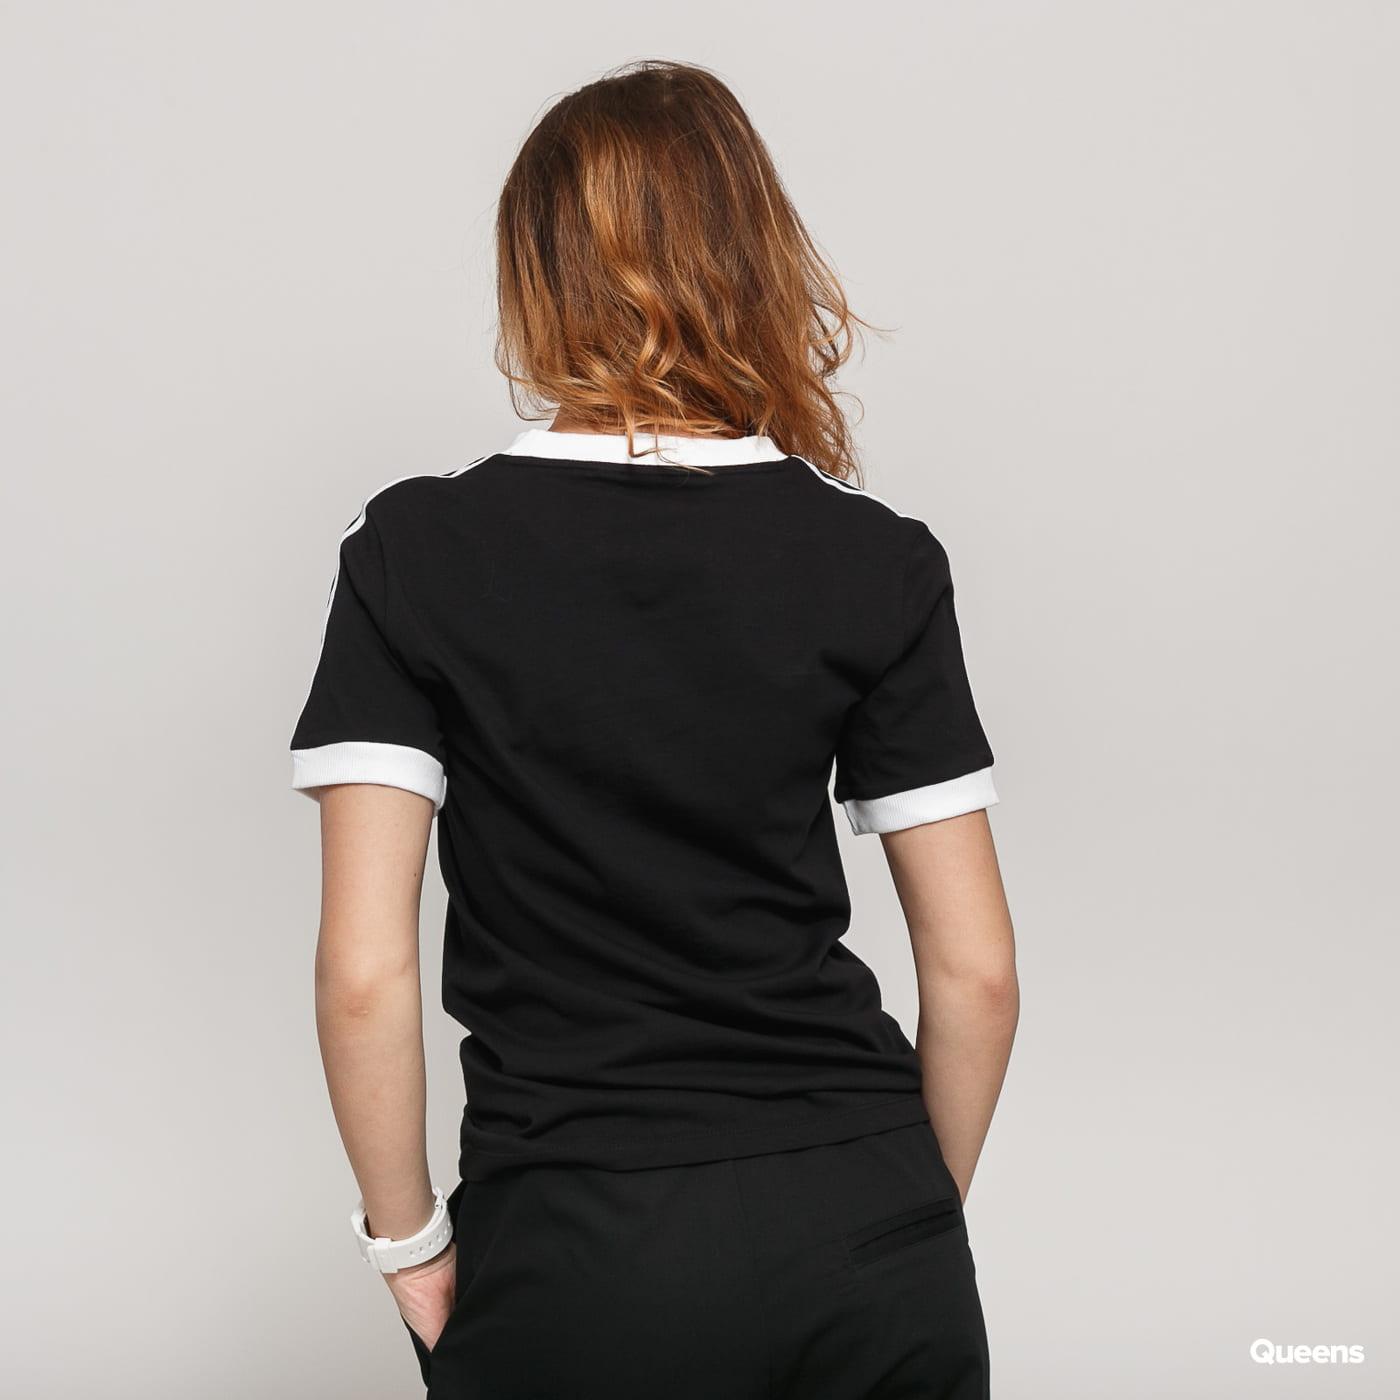 adidas Originals 3 STR Tee black / white